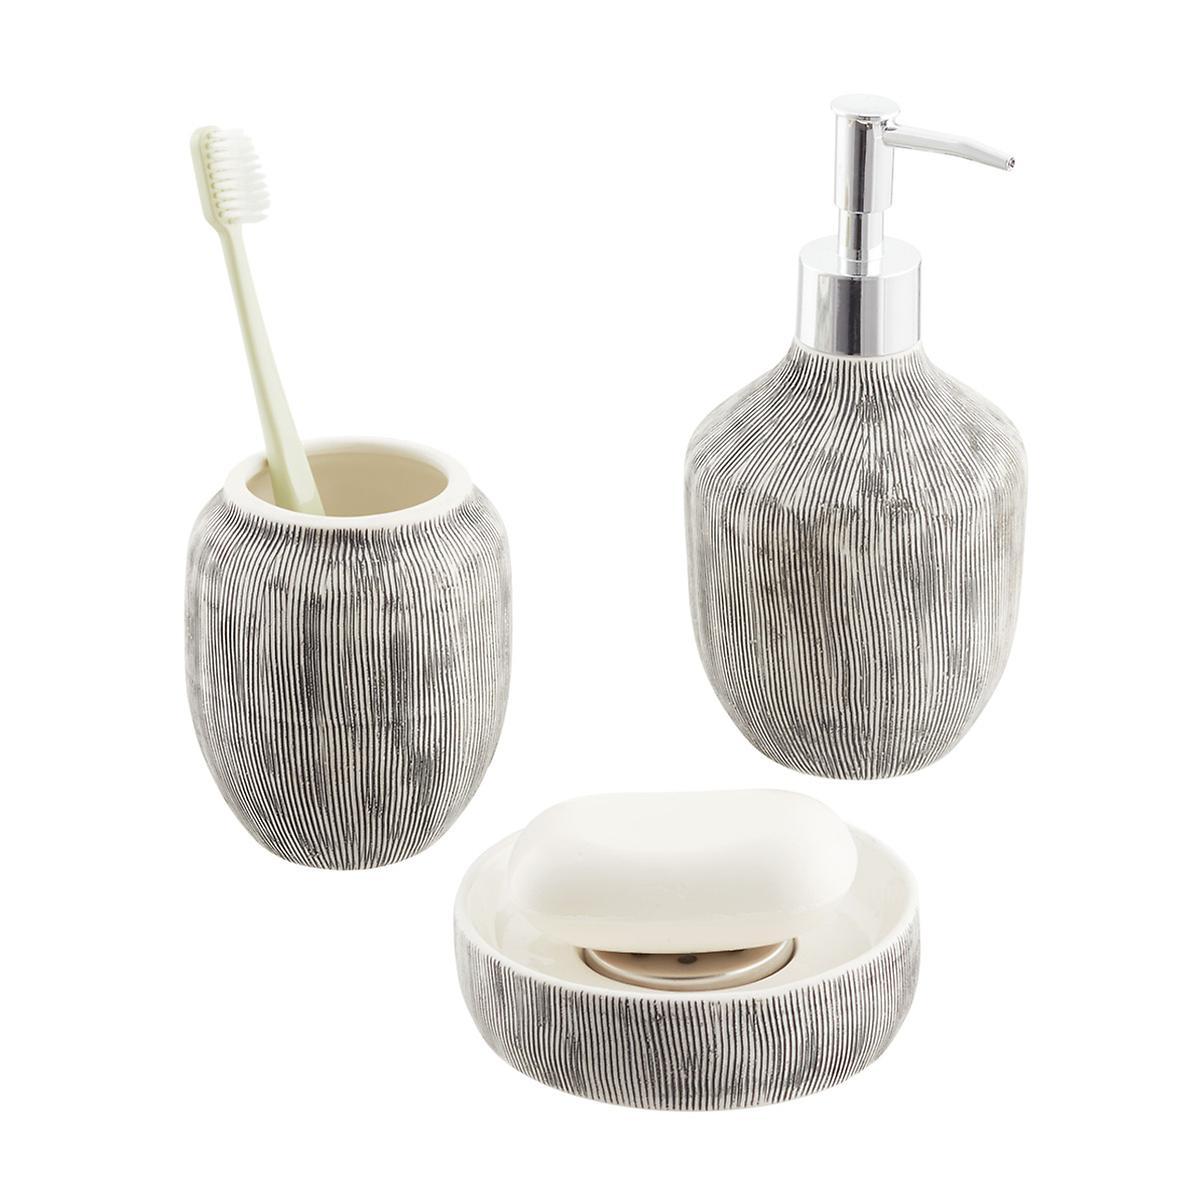 White Ceramic Countertop Bathroom Set | The Container Store